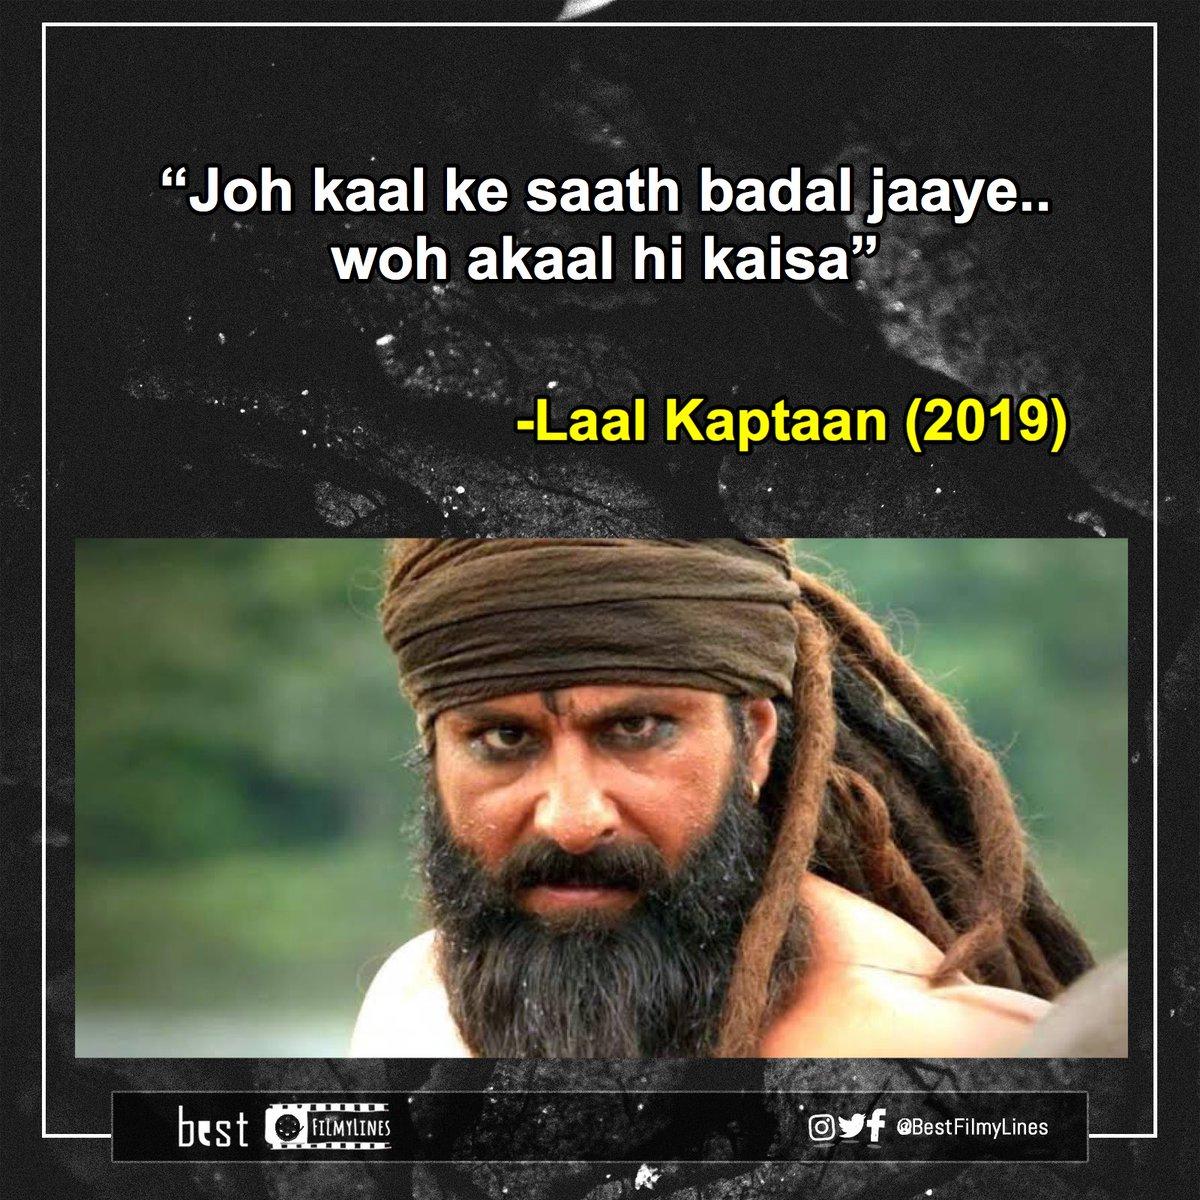 -Laal Kaptaan (2019), dir. Navdeep Singh  #LaalKaptaan #SaifAliKhan #bollywood #bollywoodmovie #bollywoodmovies #bollywooddialogue #indiancinema #hindi #hindimovie #dialogue #dialogues #quote #quotes #bestfilmylinespic.twitter.com/NRp54MP5yX